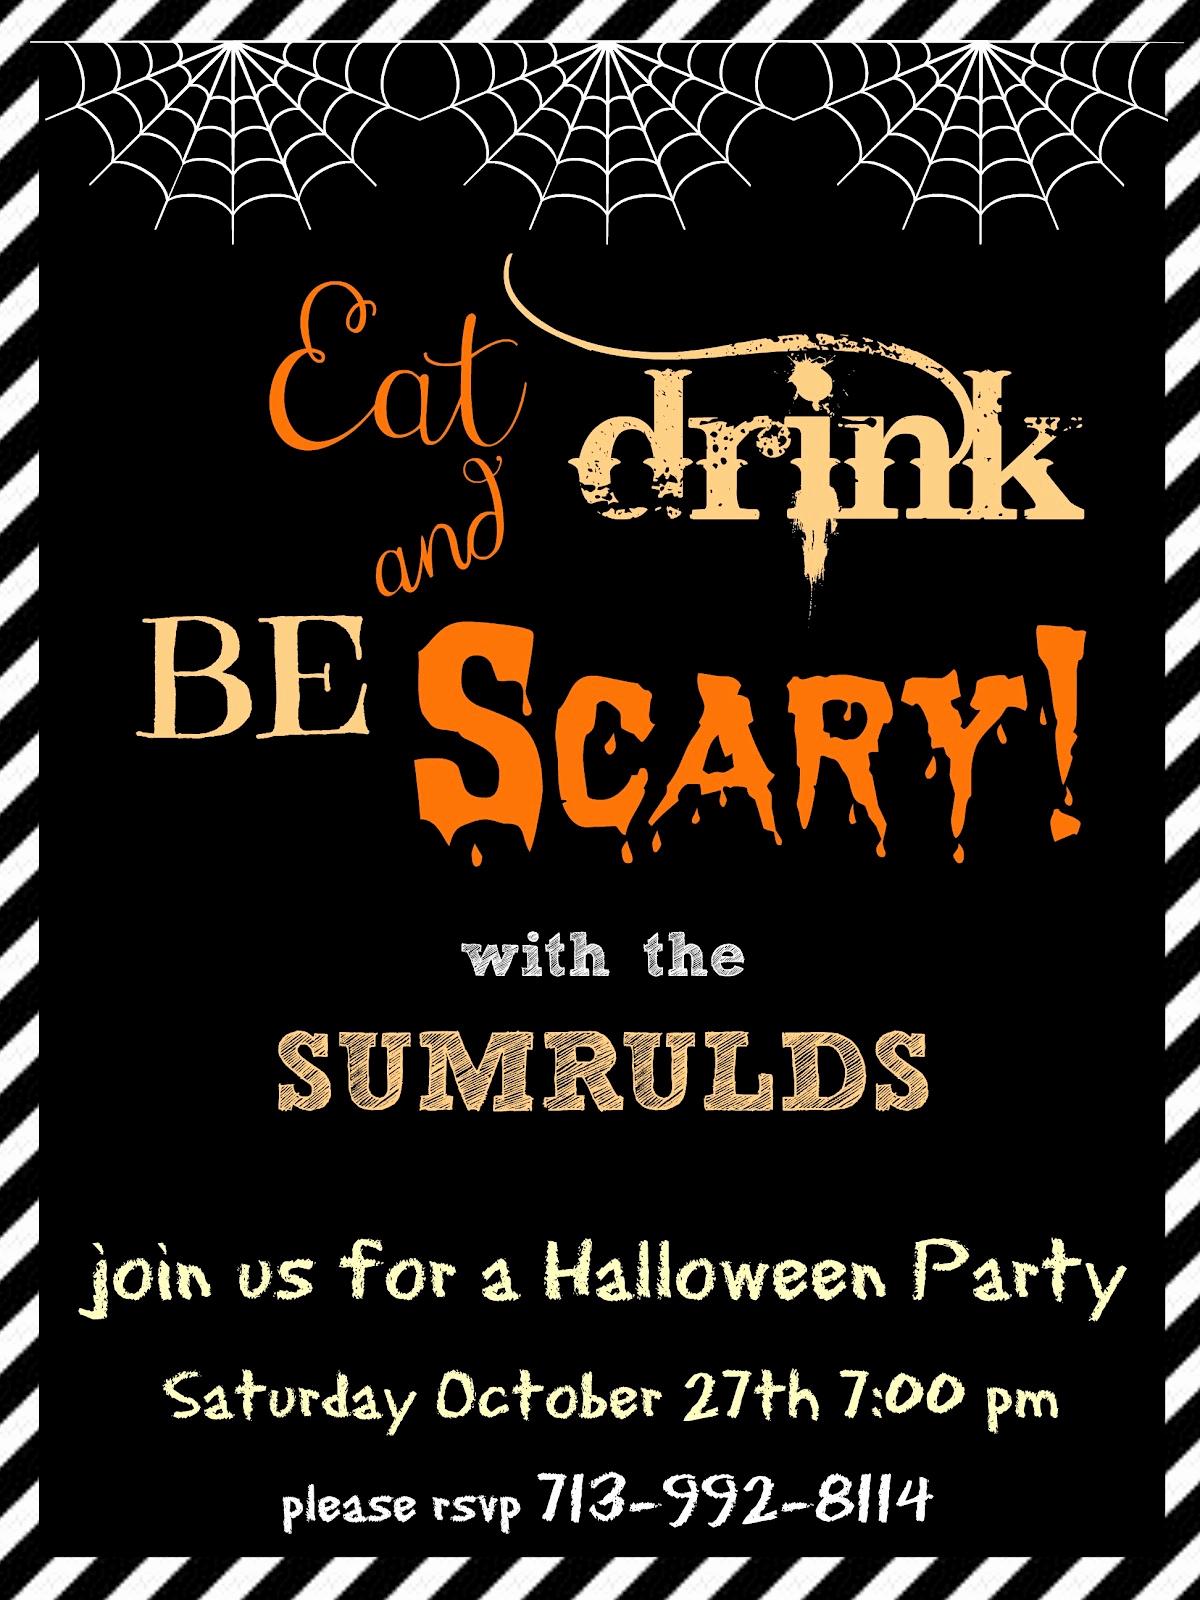 Halloween Party Invitation Template Luxury Halloween Party Invitation Templates Free – Festival